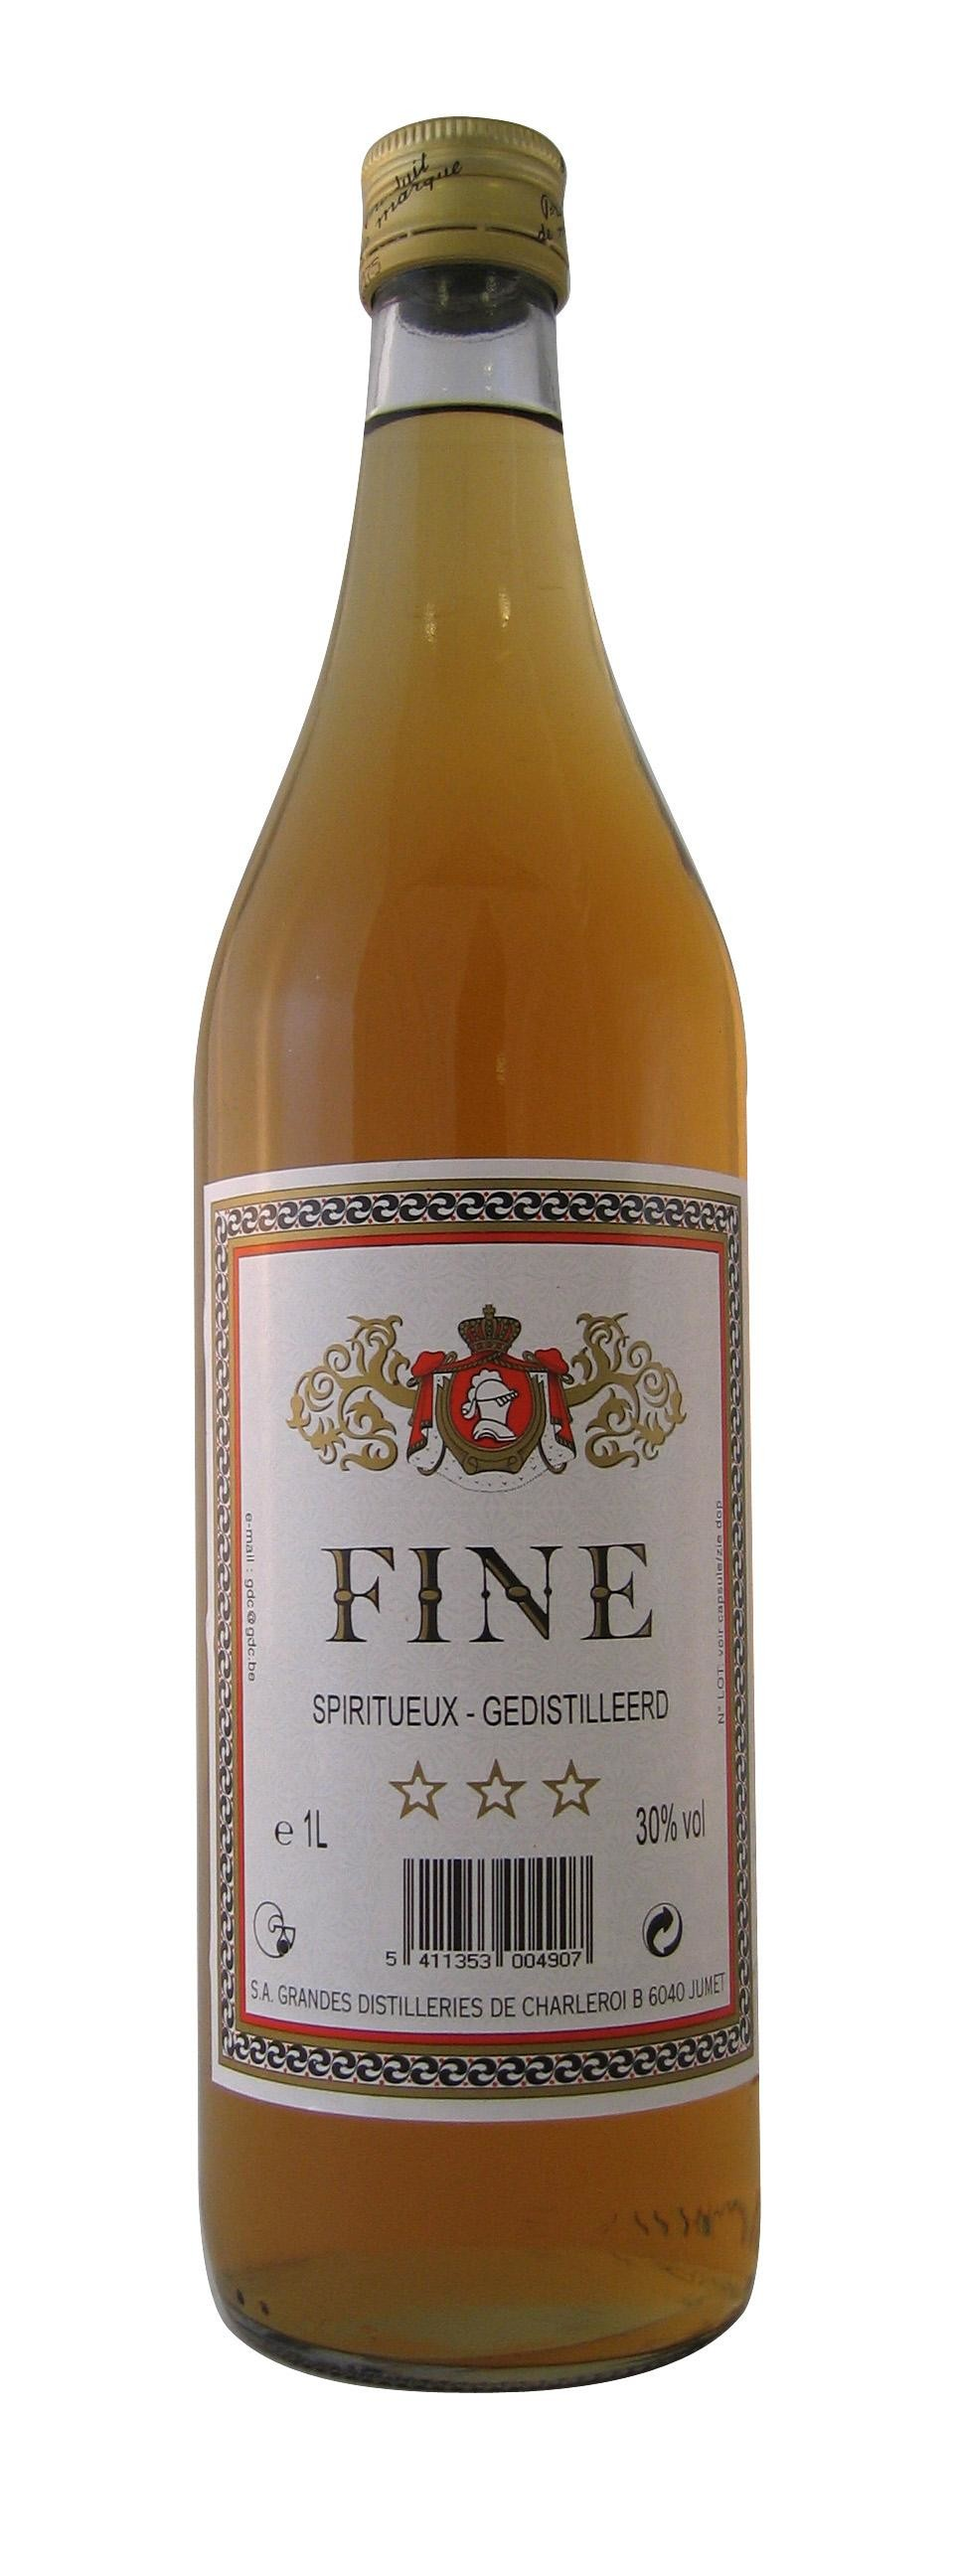 Cognac cuisine Fine 1L 30% Brandy